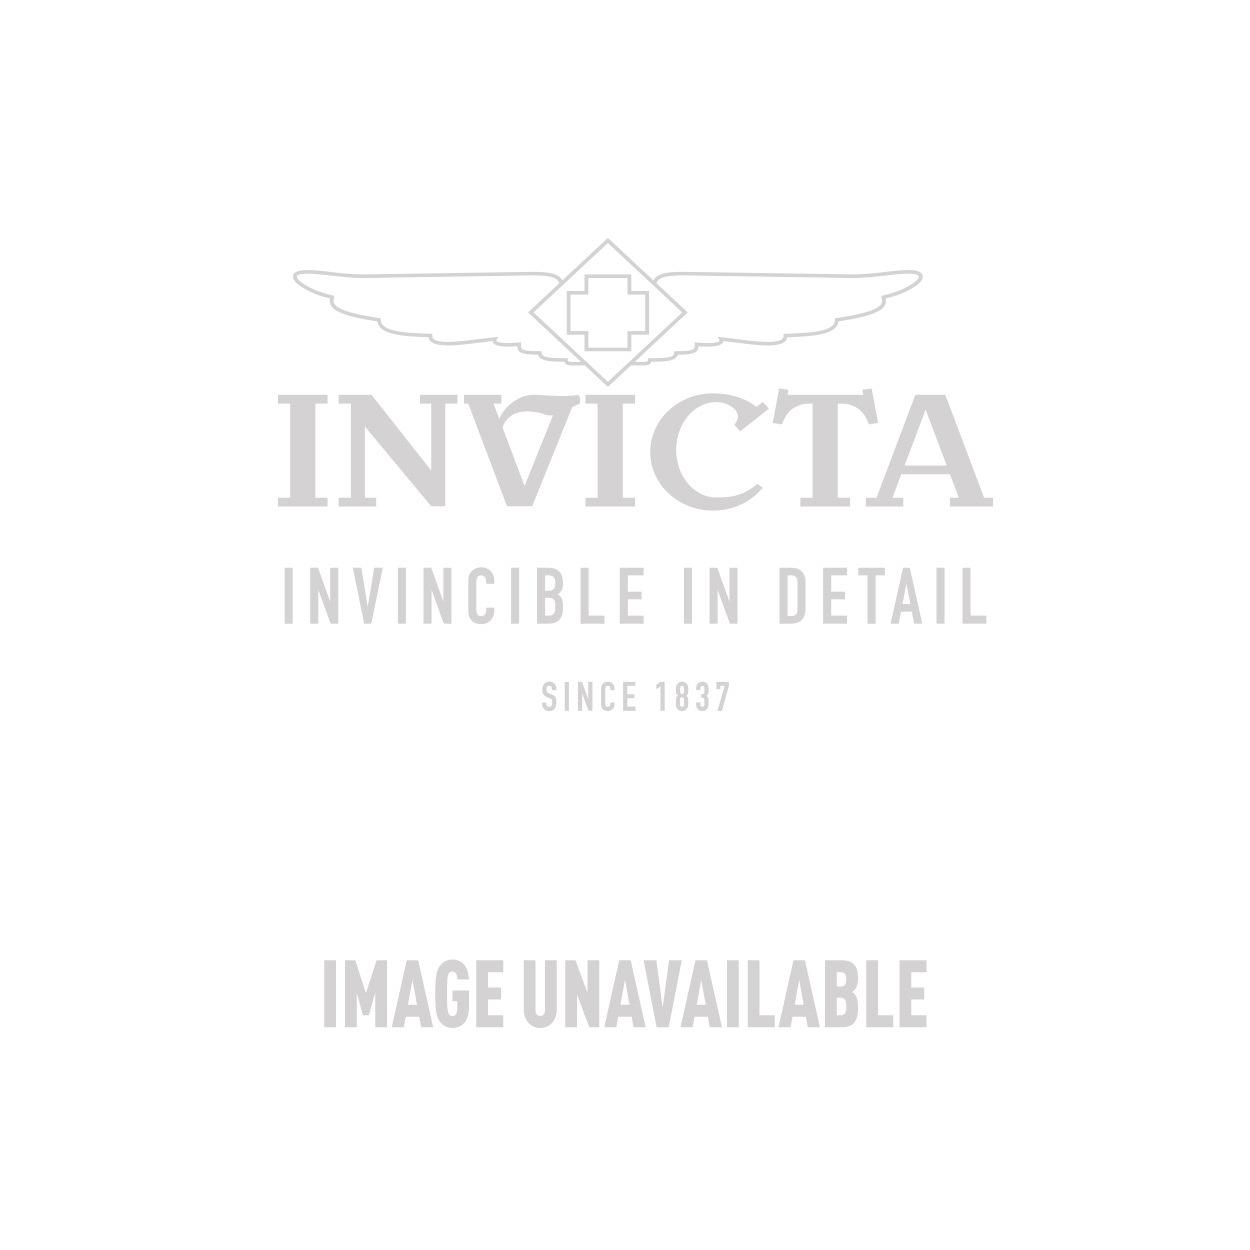 Invicta Corduba Swiss Movement Quartz Watch - Rose Gold case with White tone Leather band - Model 90224